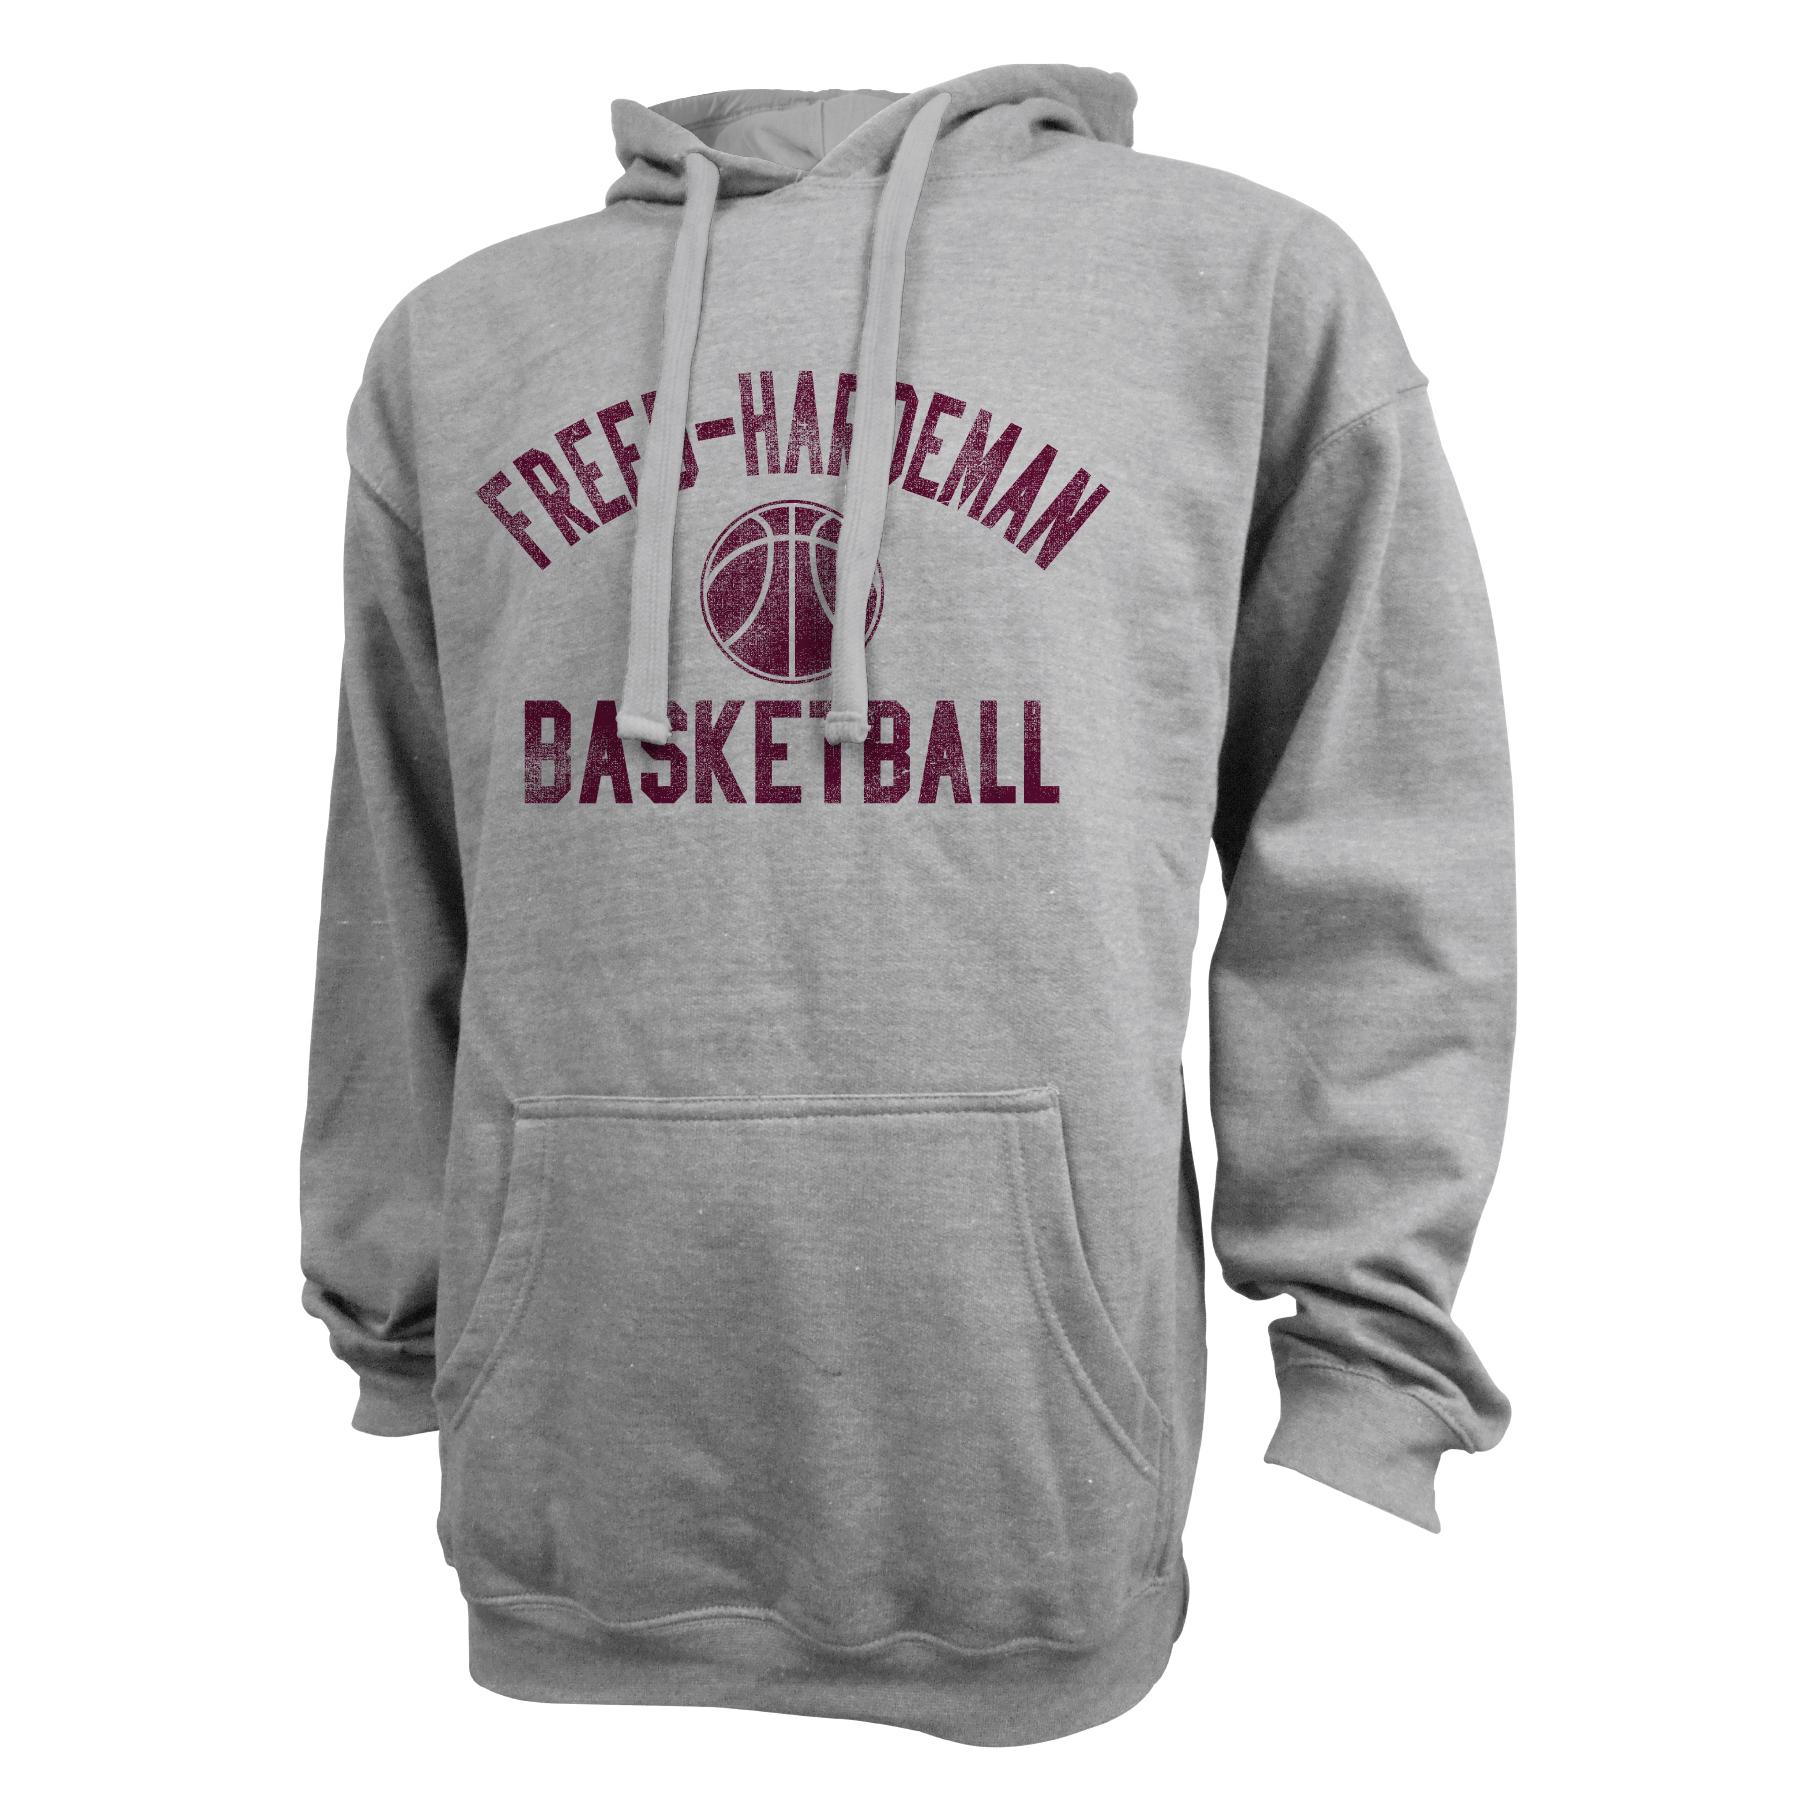 FHU Basketball Hoodie